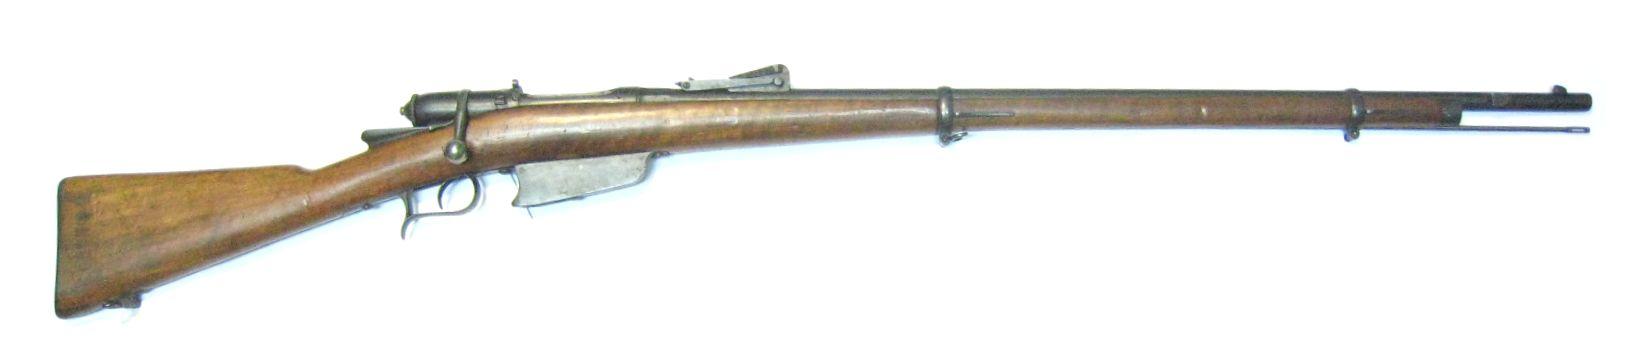 Vetterli Vitali M1870/87/15 calibre6.5x52carcano